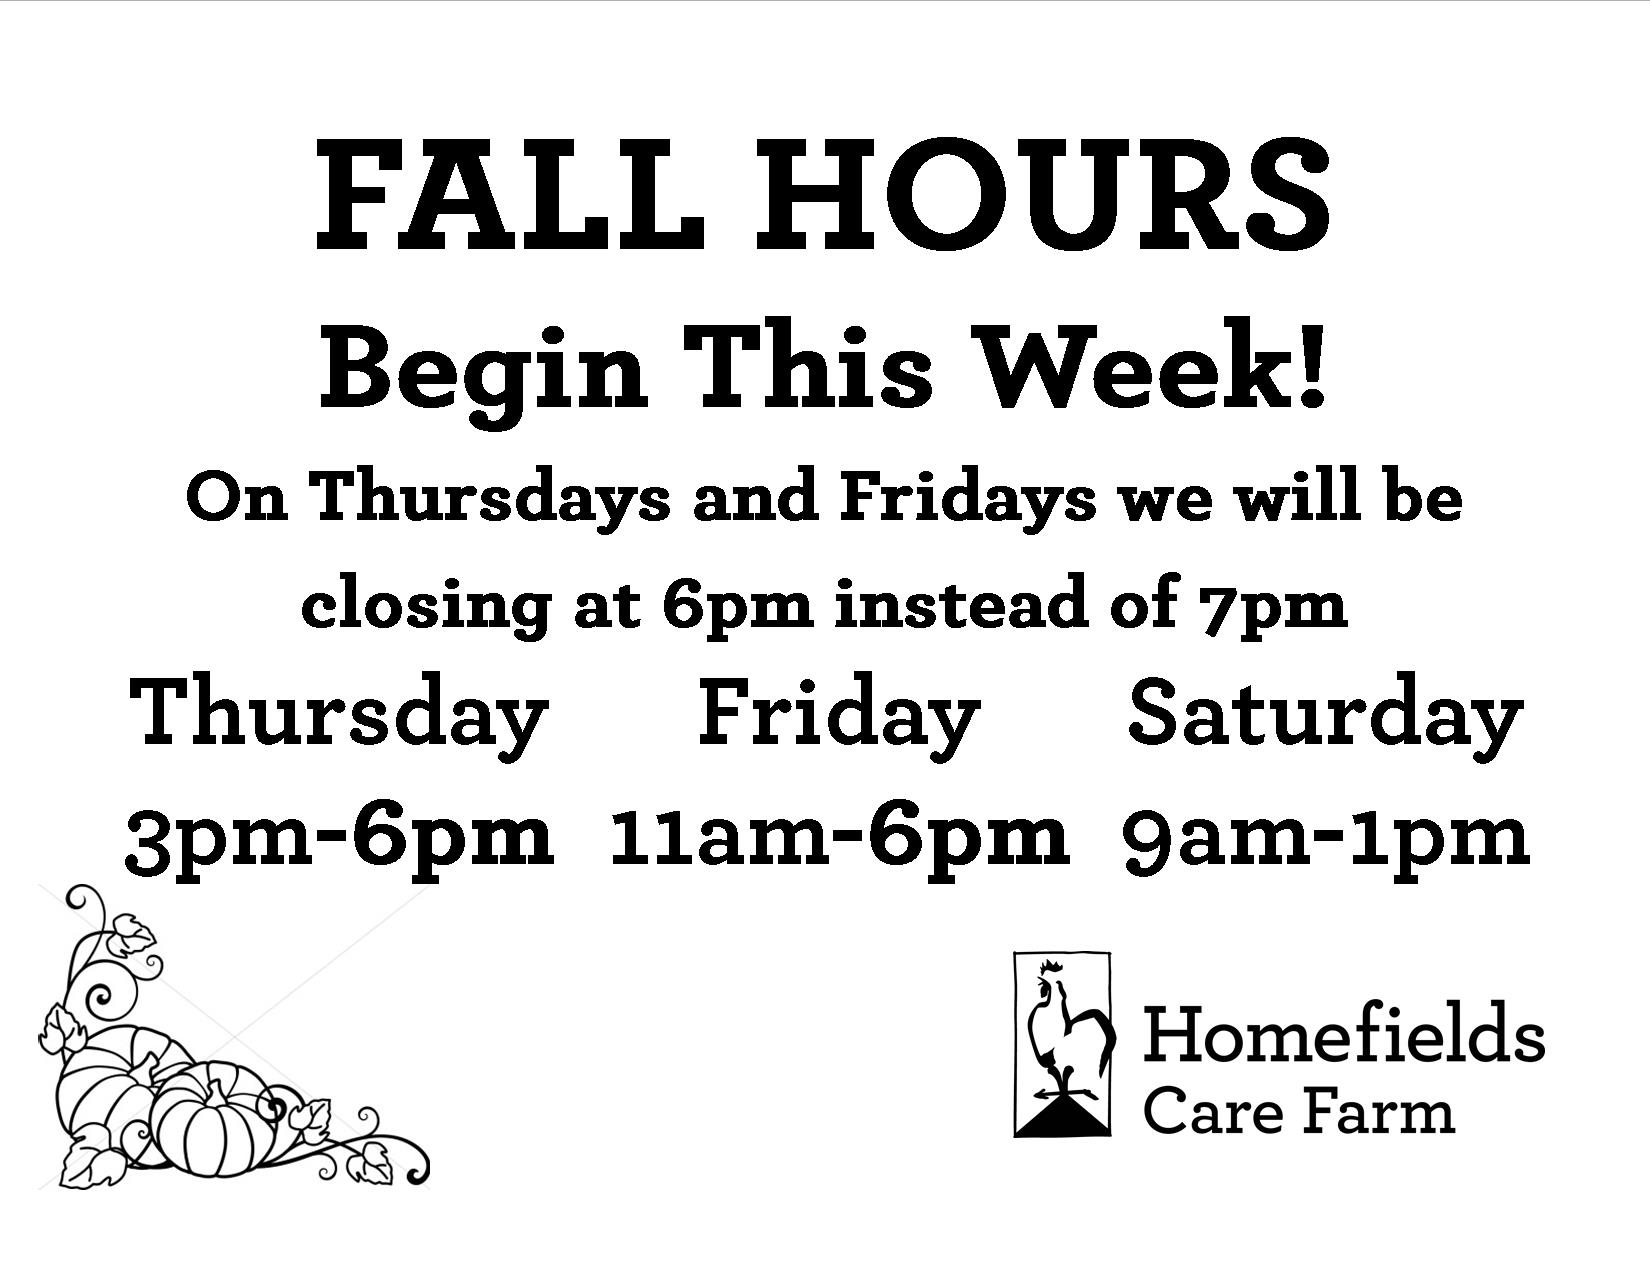 Farm Happenings for week of October 11th